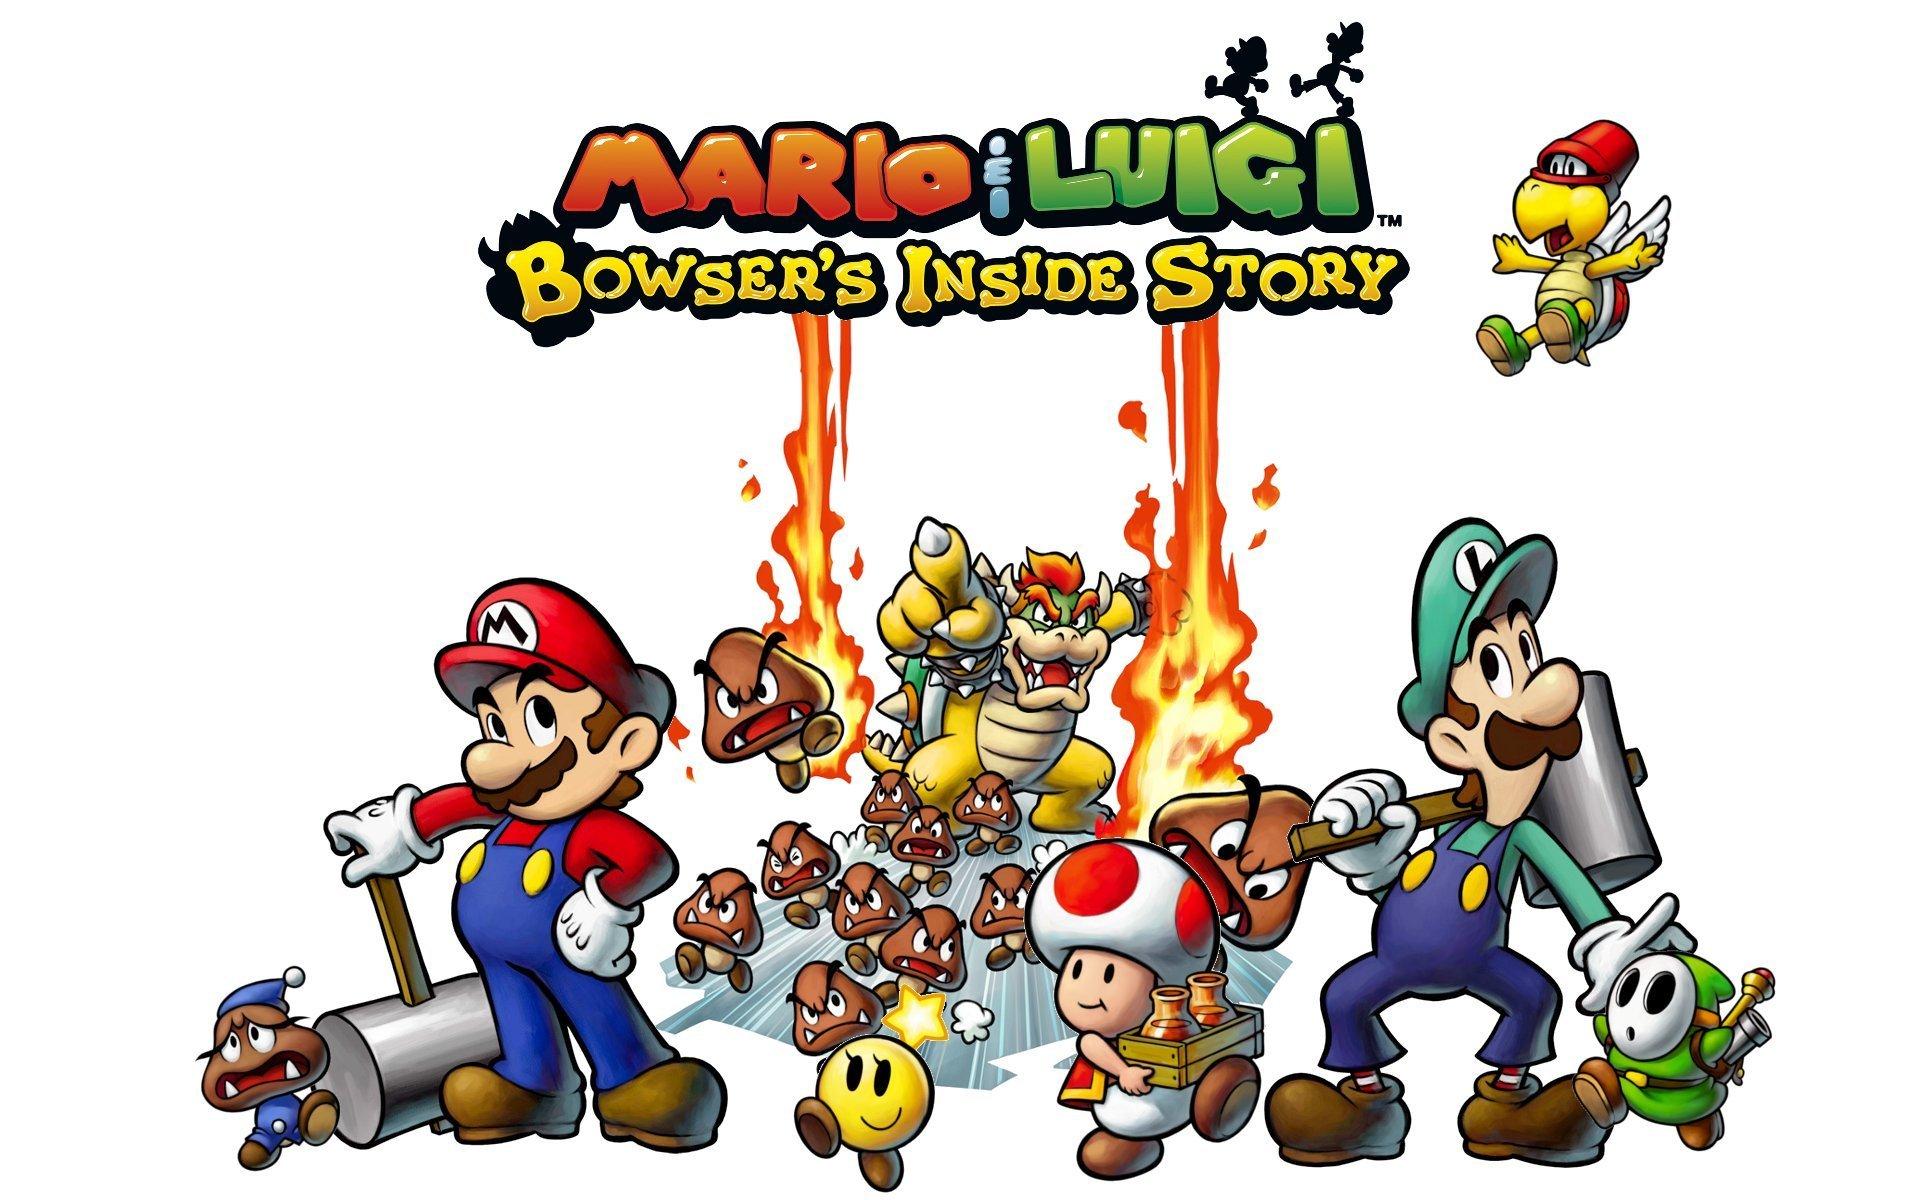 Fondo De Pantalla Mario And Luigi Bowser S Inside Story Fondo De